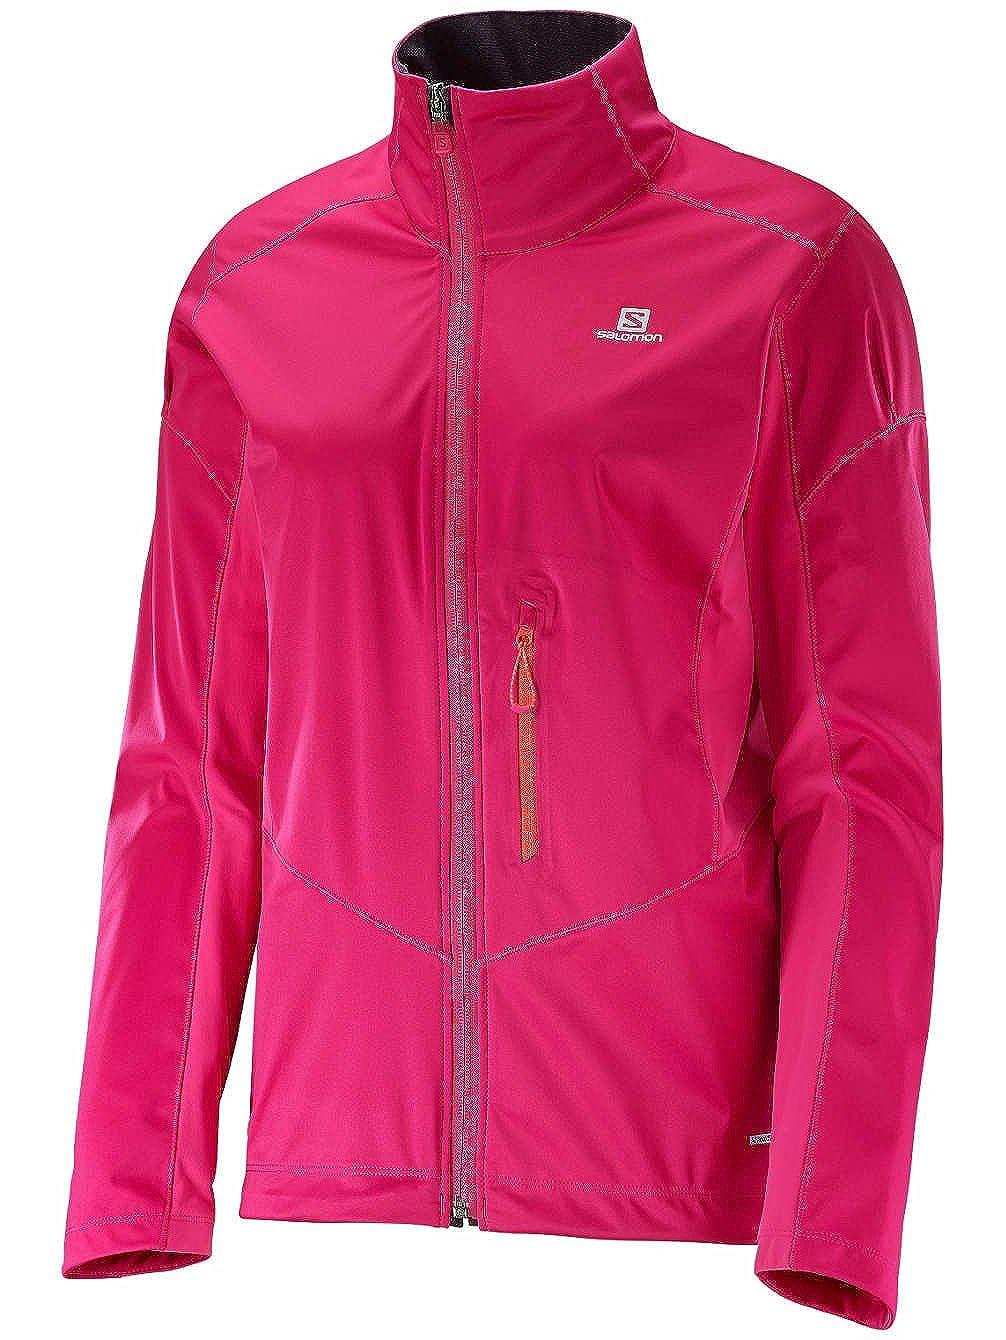 Salomon Damen Outdoor Jacke Lightning Softshell Outdoorjacke